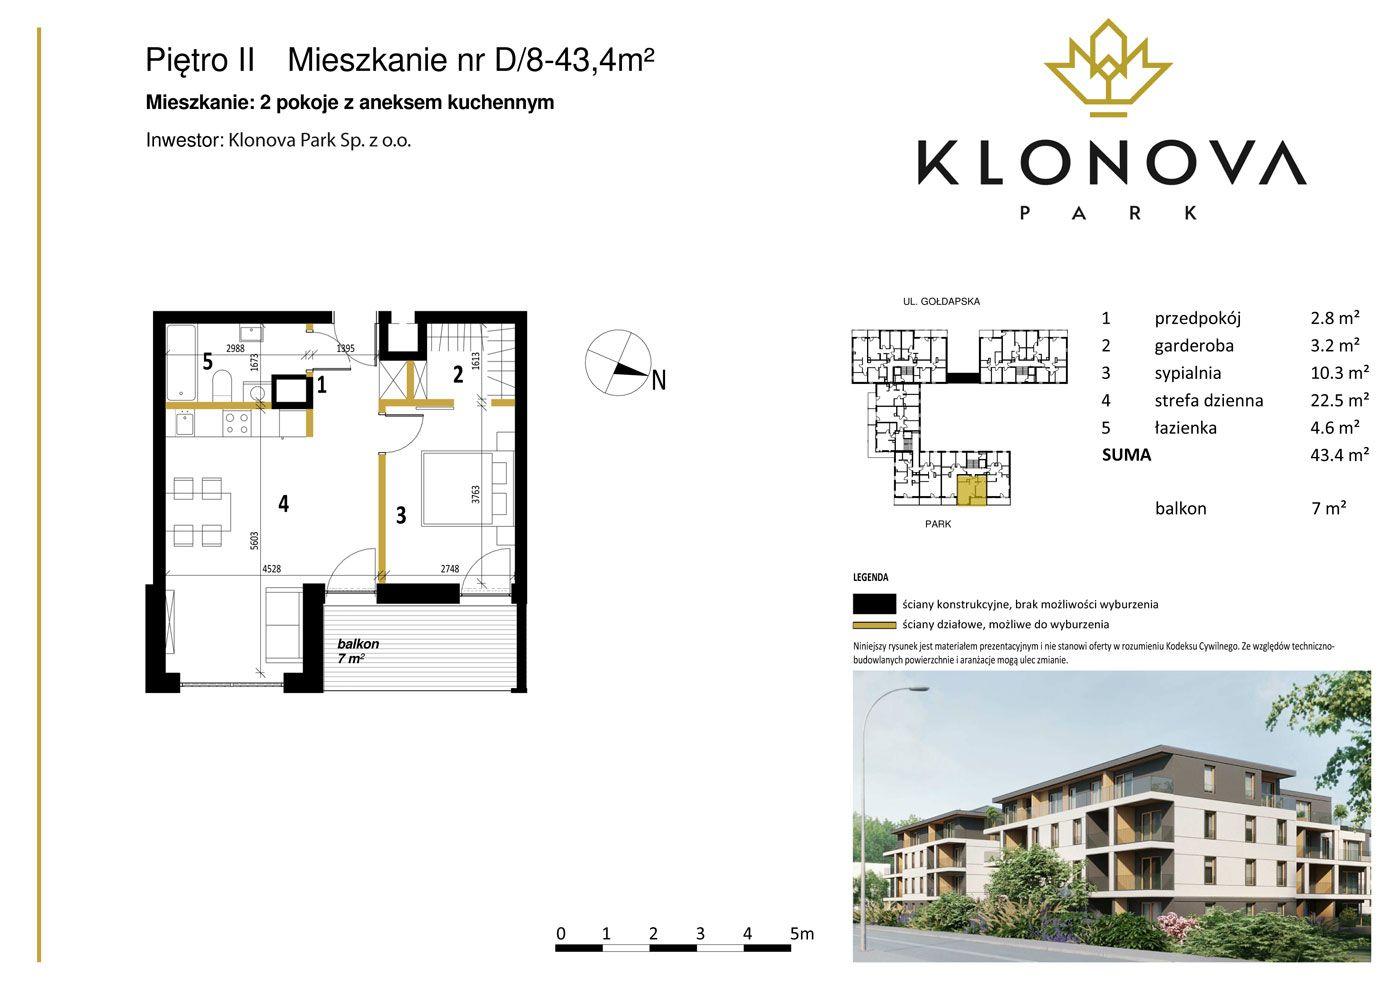 Apartamenty Klonova Park - Plan mieszkania D/8